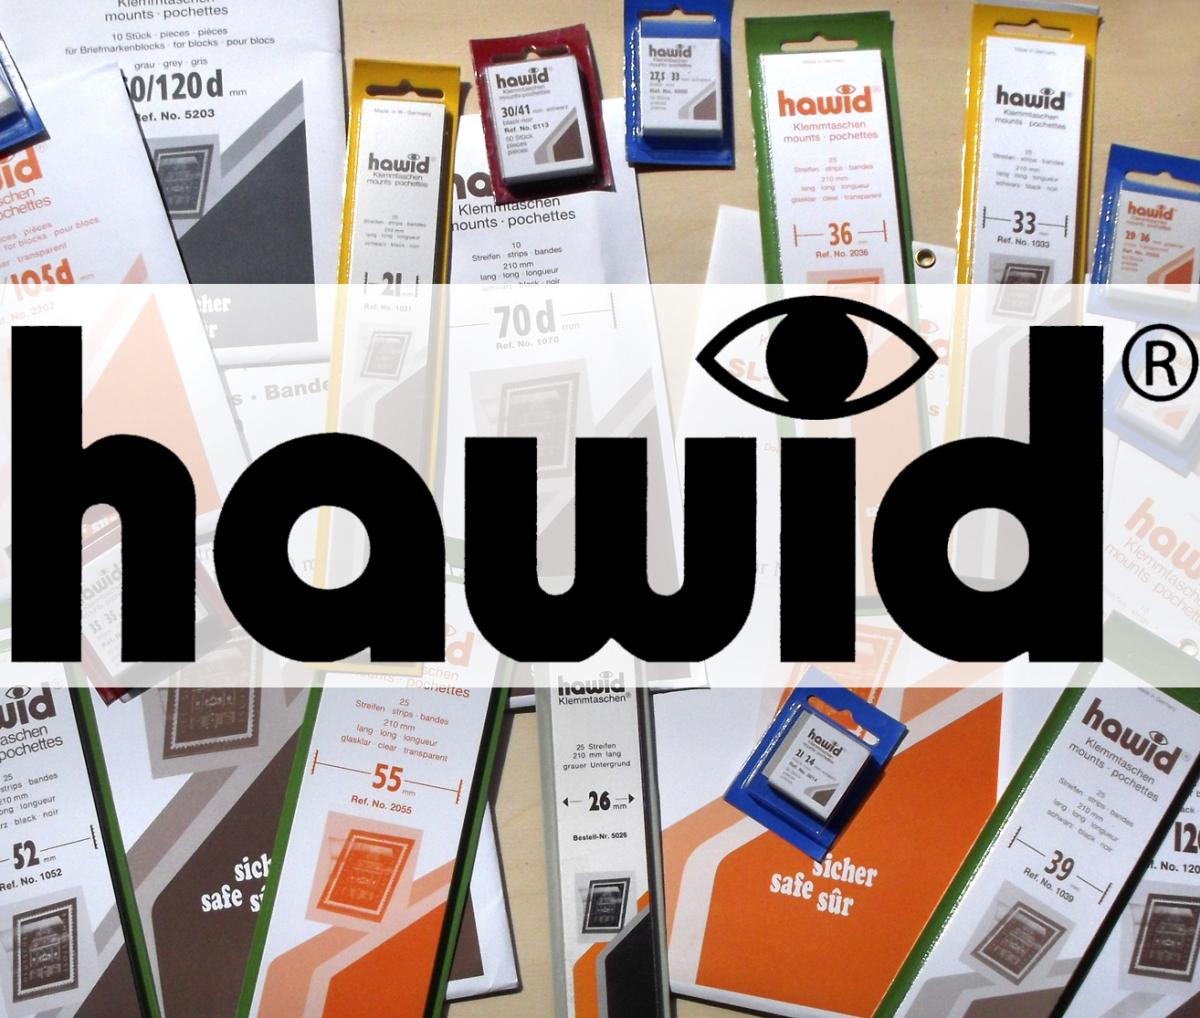 HAWID-Sonderblocks 1343, 165x111 mm, schwarz, 6 Stück 0